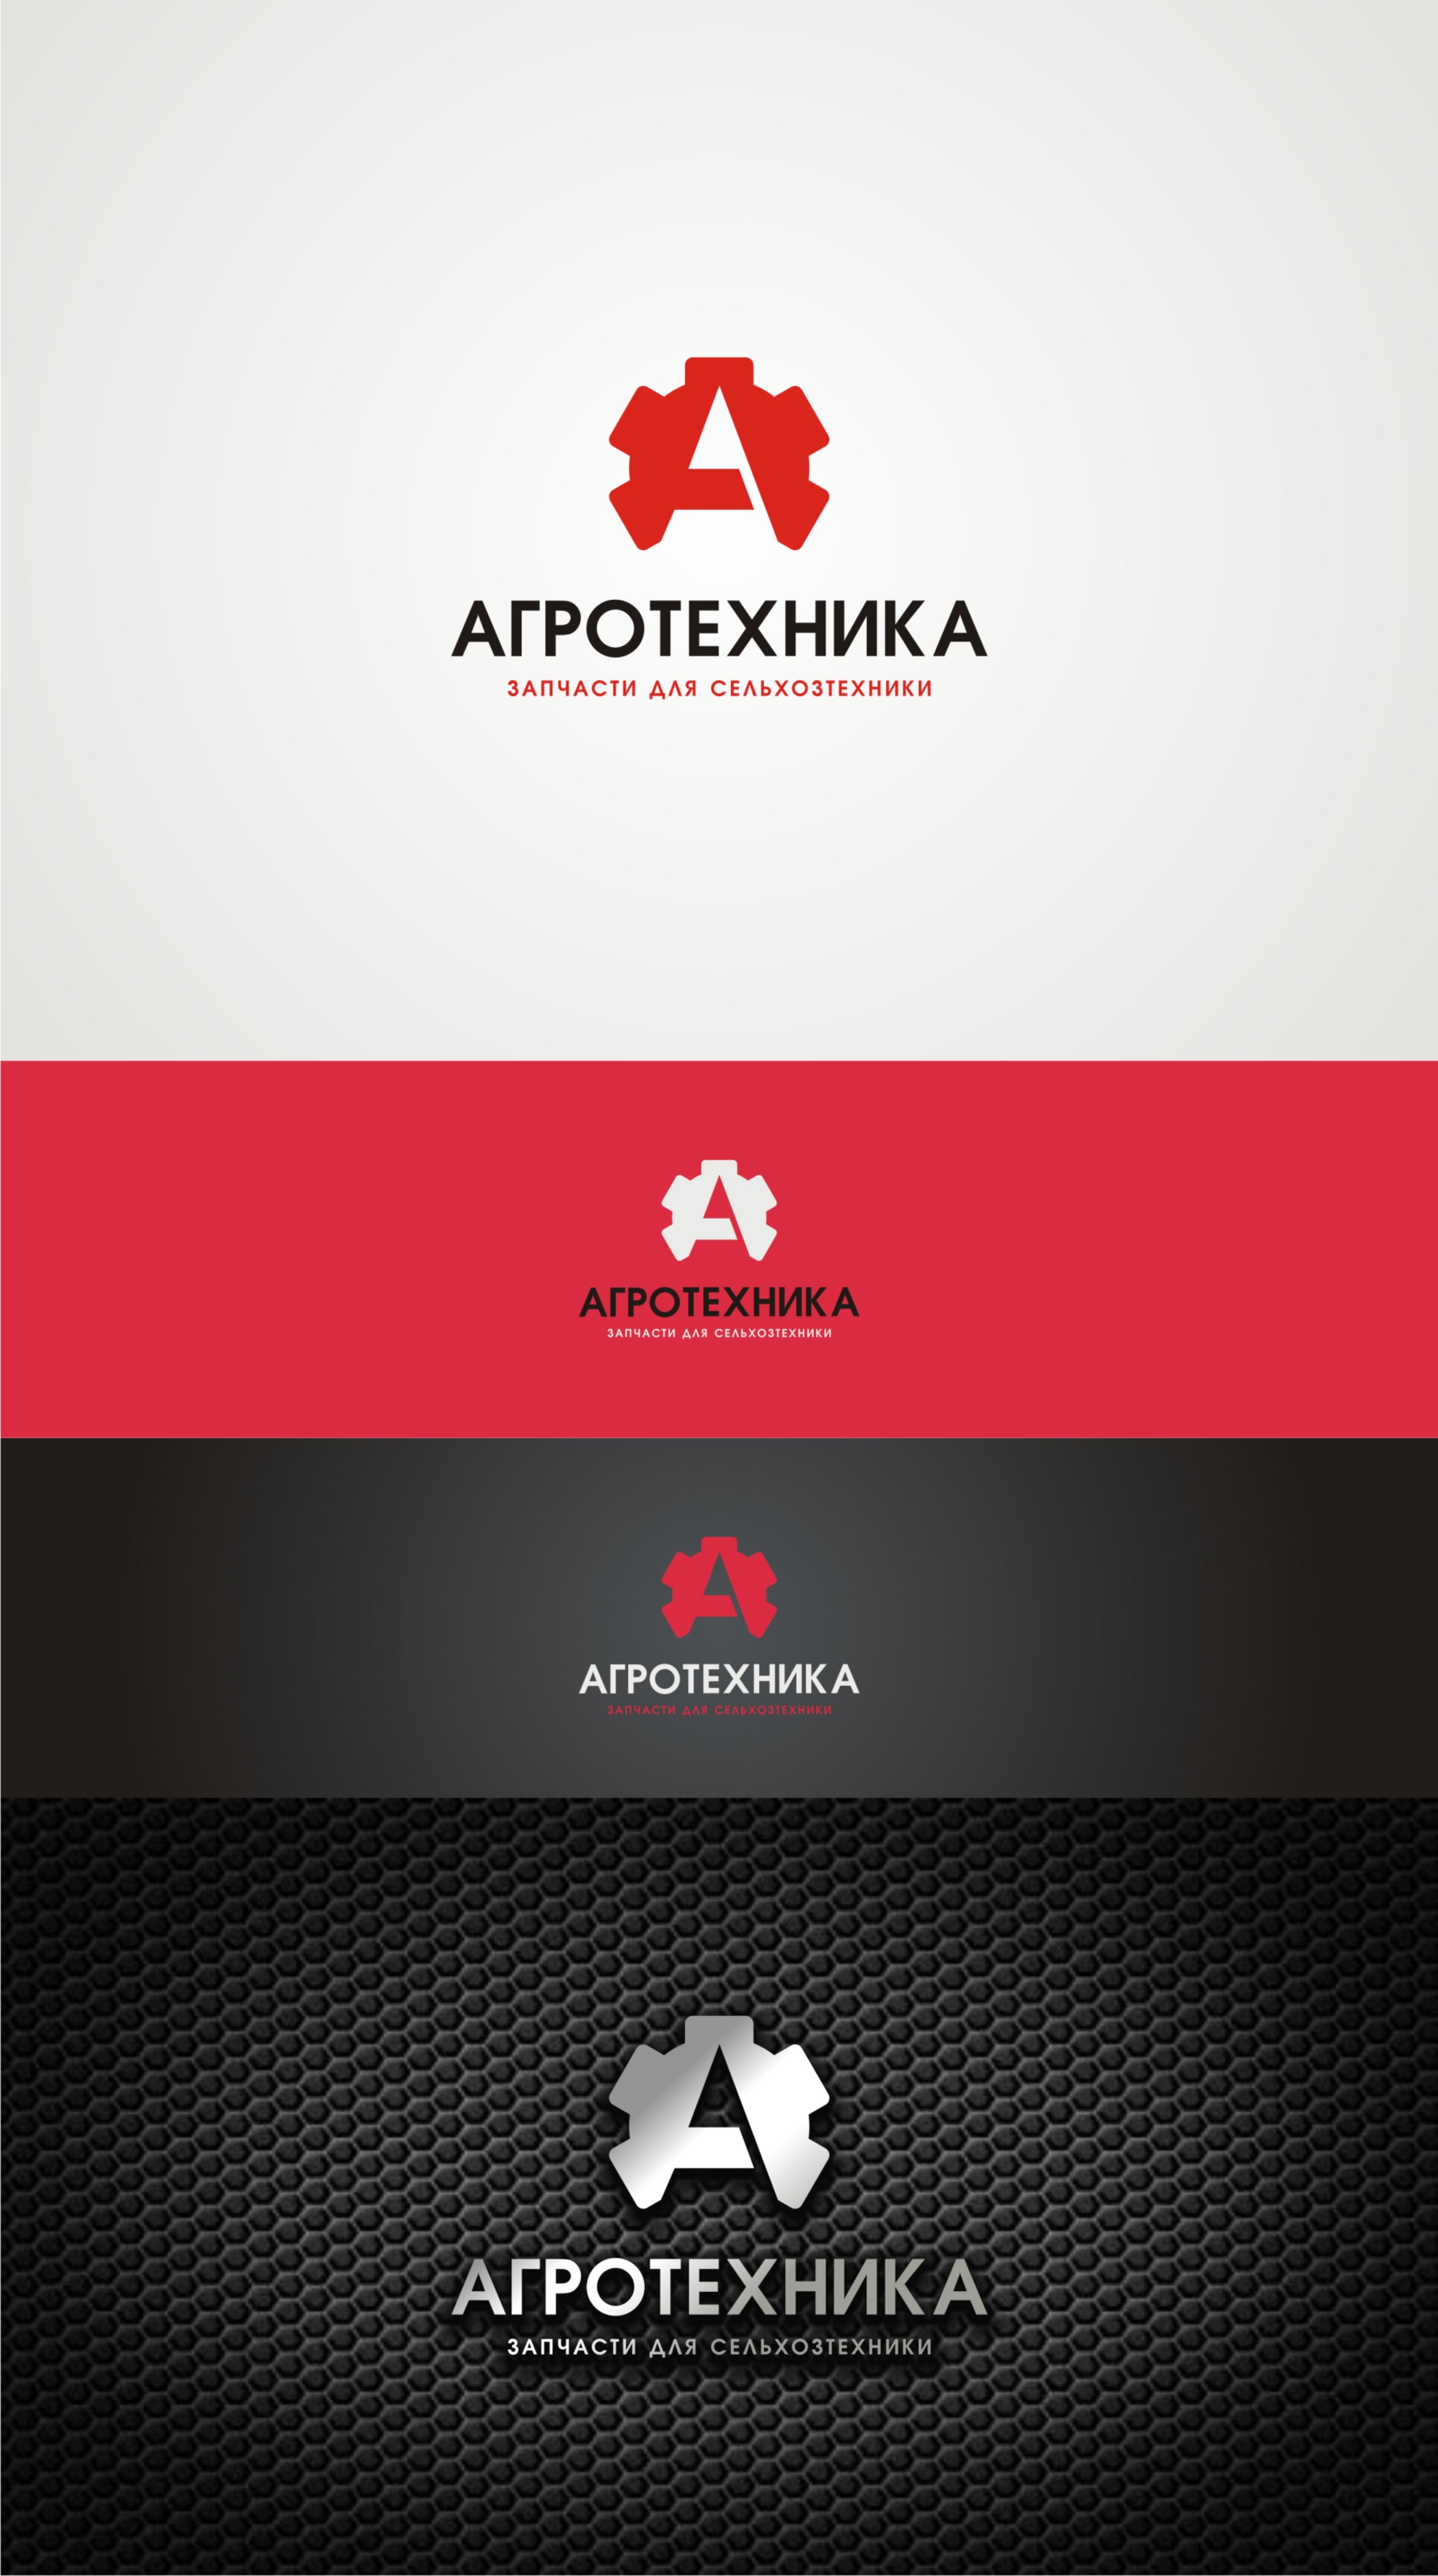 Разработка логотипа для компании Агротехника фото f_1655c02bd3bc218c.jpg